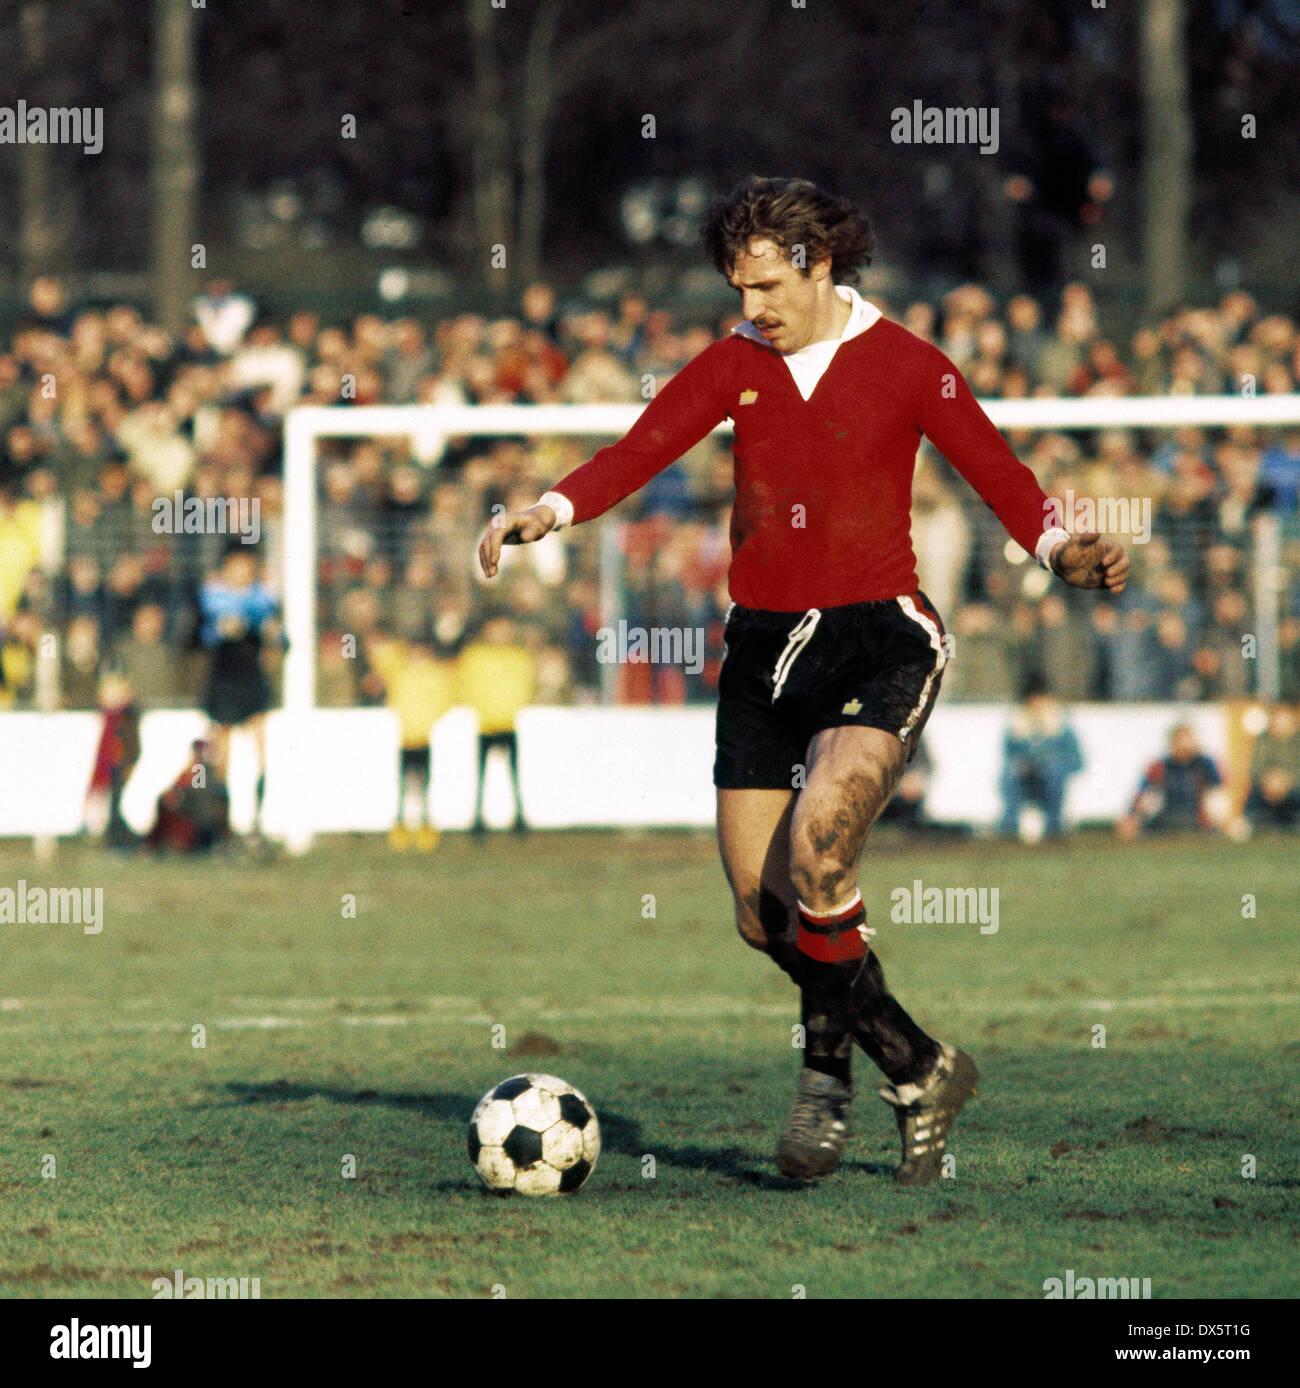 football, DFB Cup, 1976/1977, quarterfinal, Grotenburg Stadium, FC Bayer 05 Uerdingen versus Eintracht Frankfurt 6:3 AET, scene of the match, Dragoslav Stepanovic (Eintracht) in ball possession - Stock Image